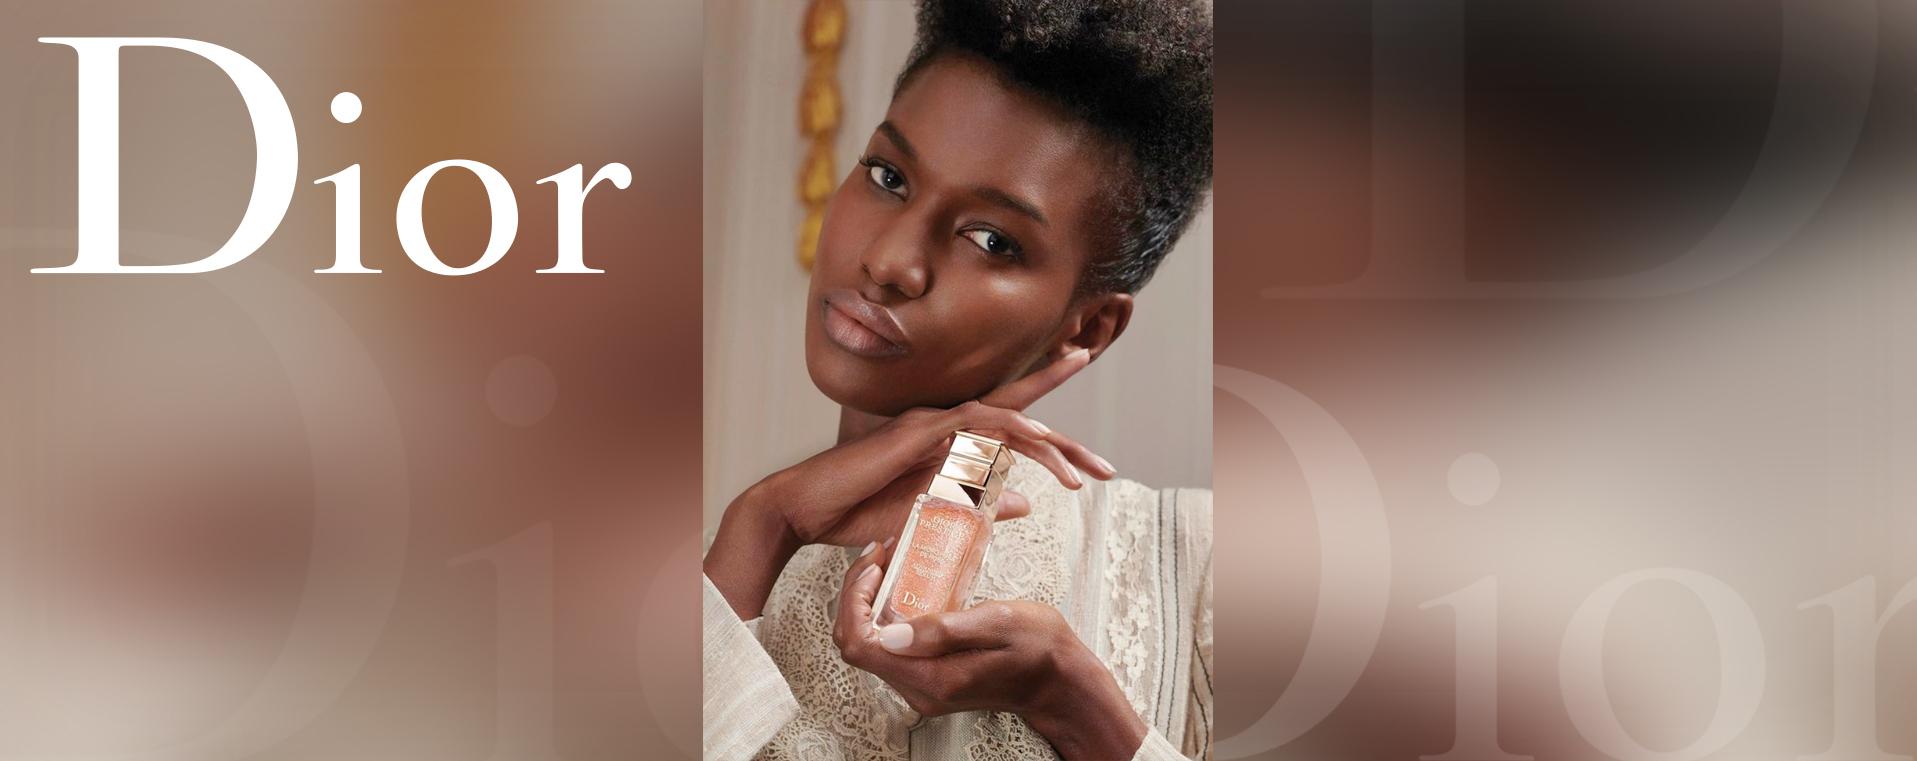 Tiah for Dior